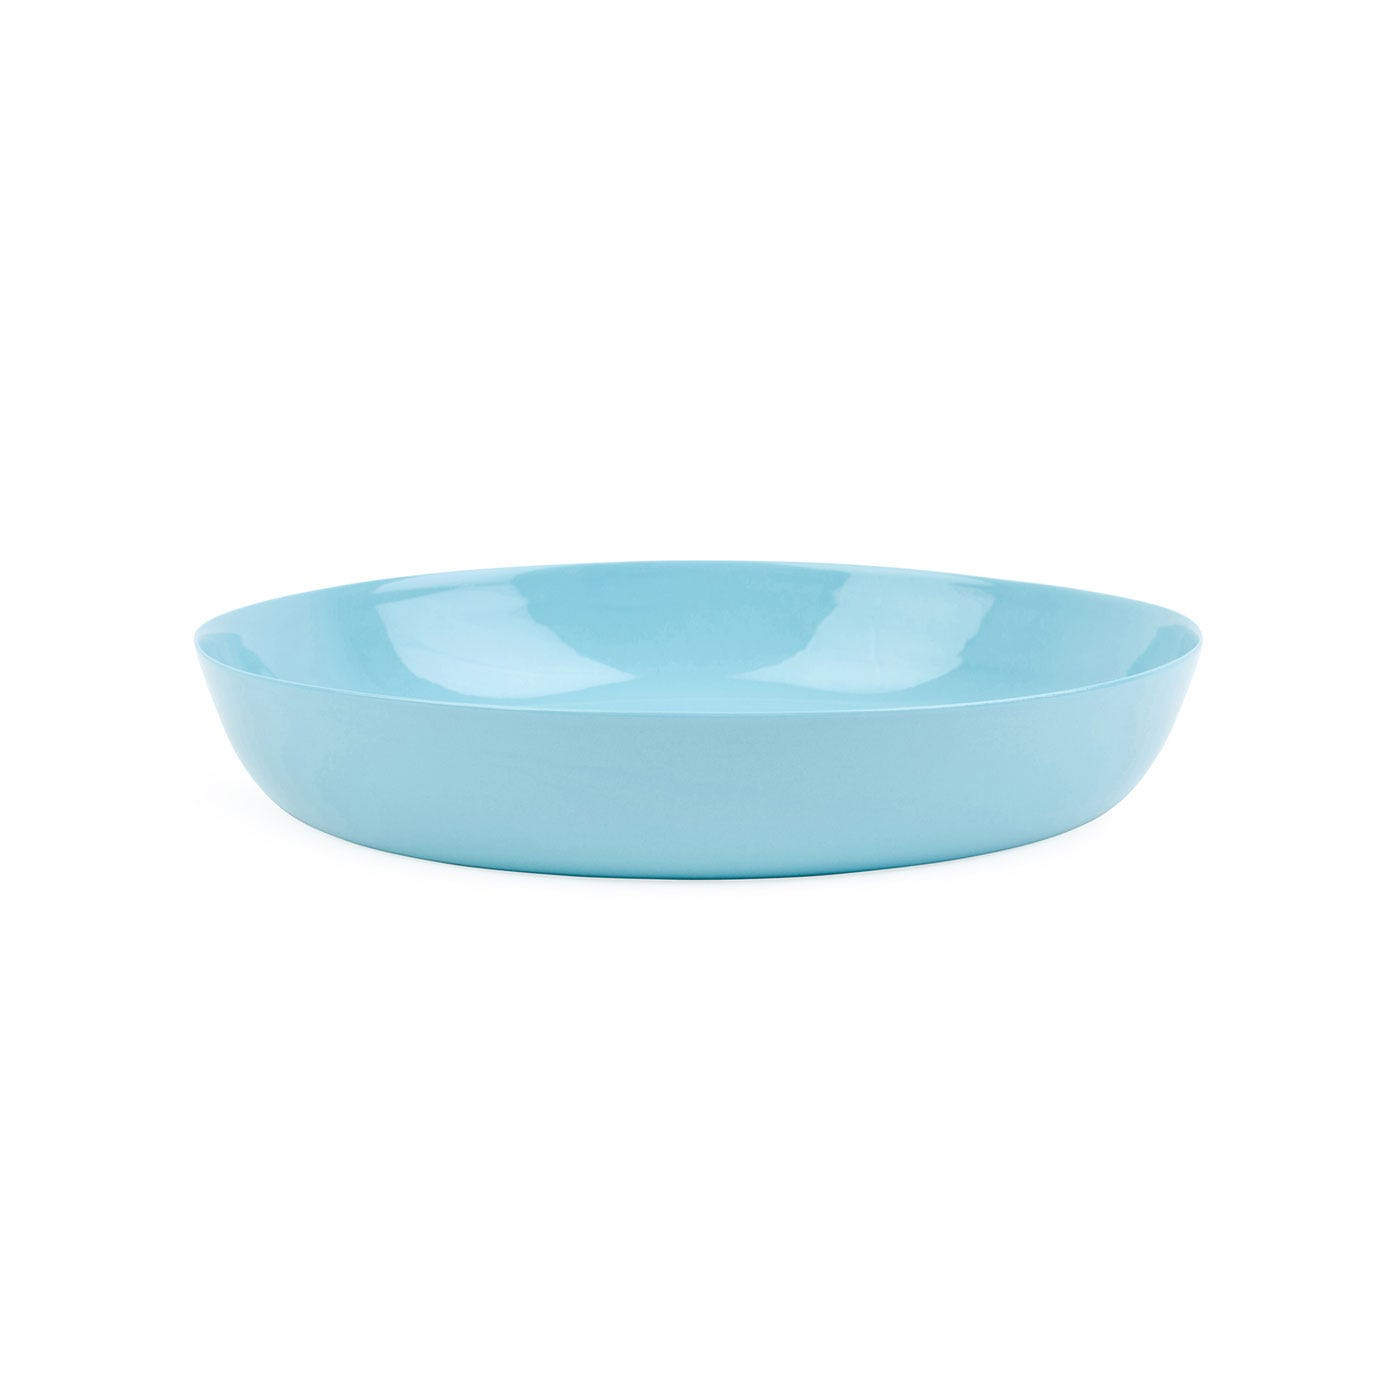 Porcelain Pasta Bowl Turquoise